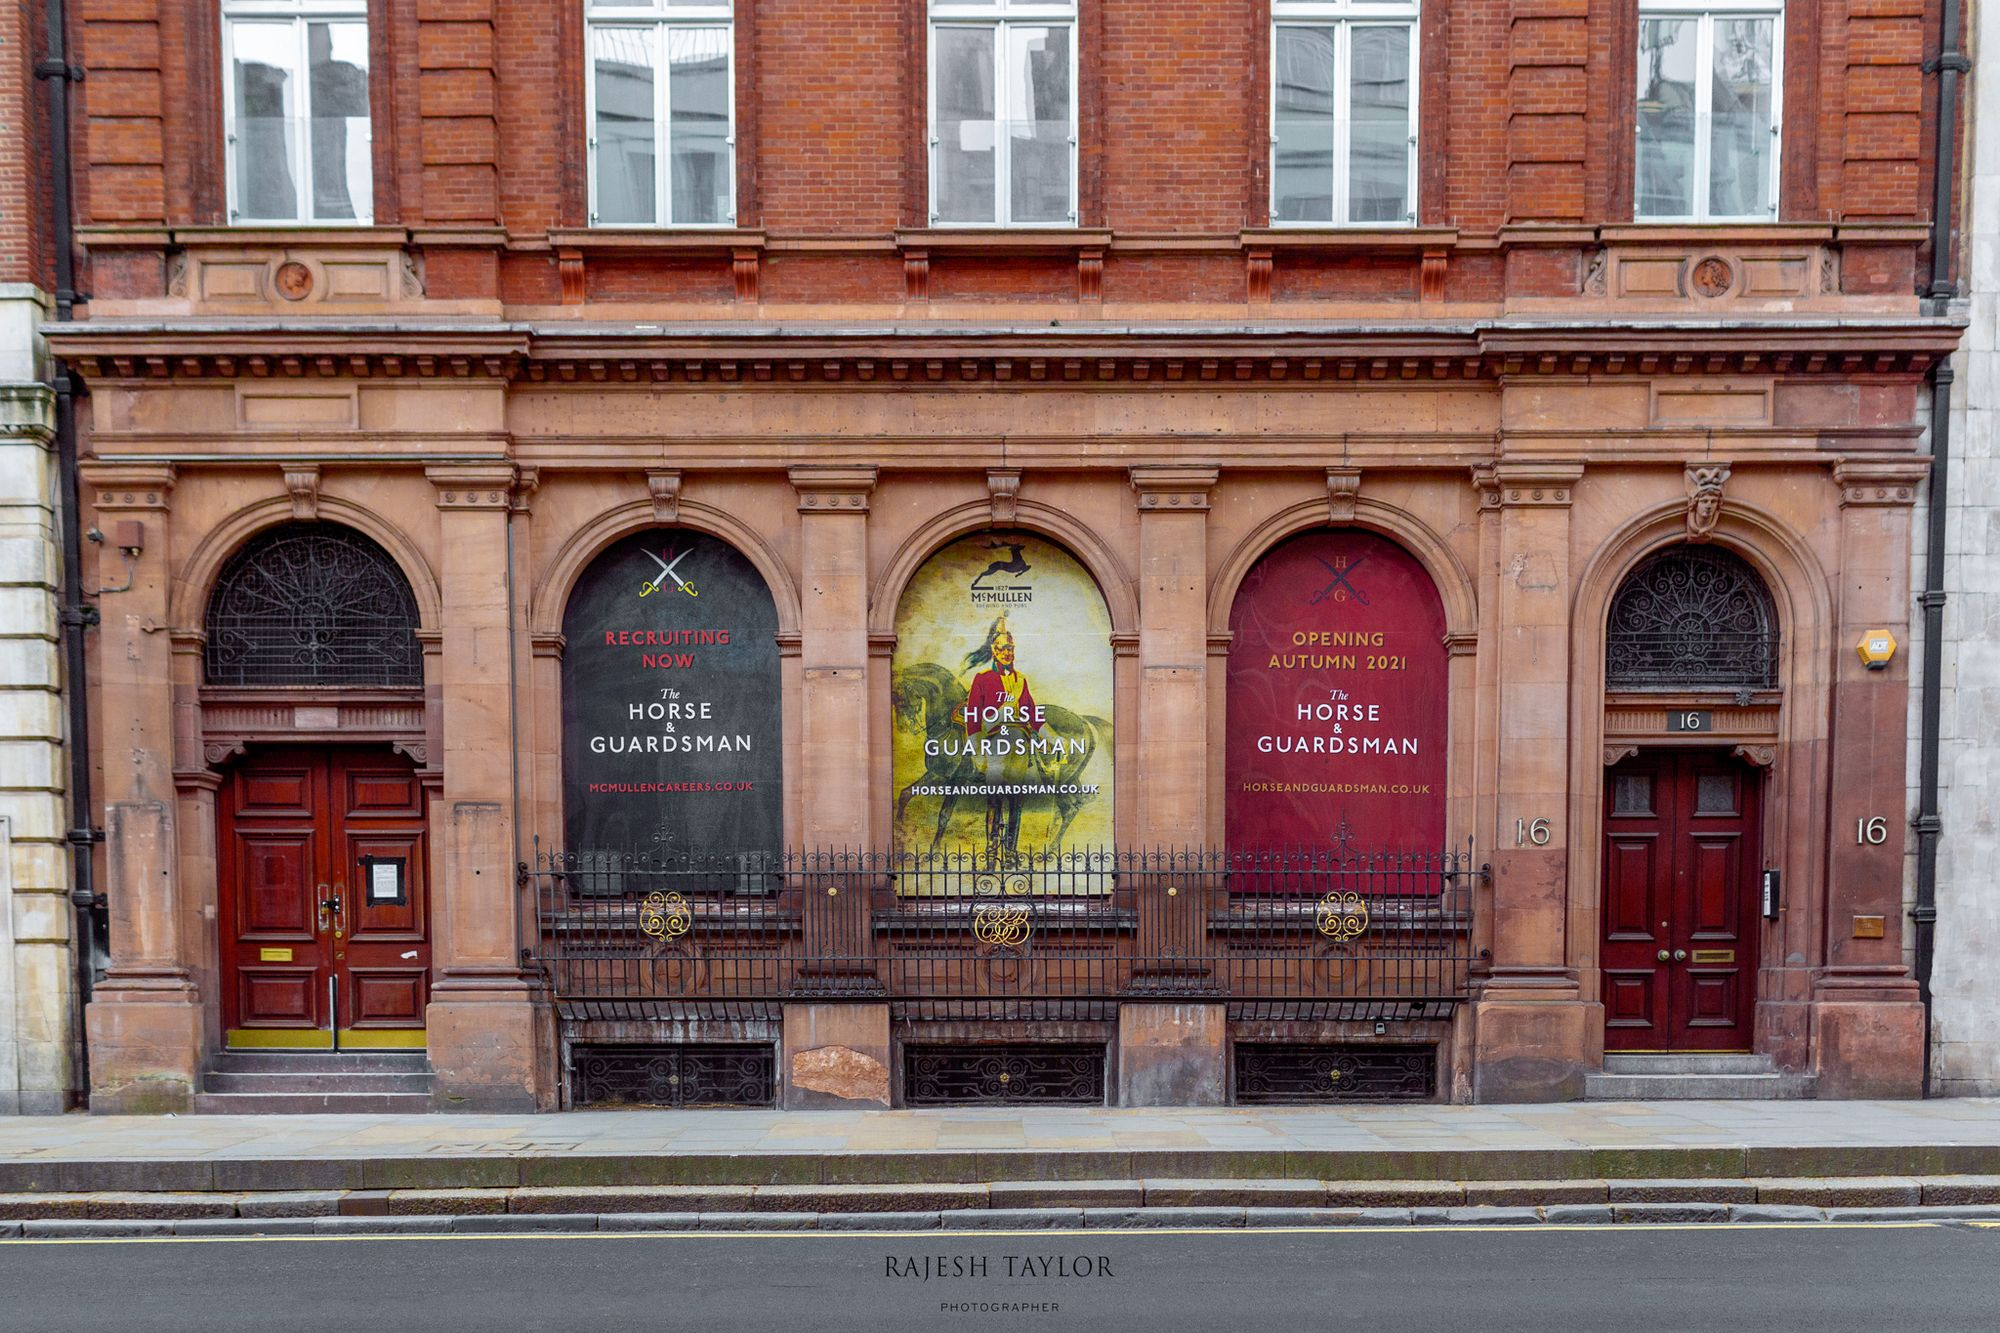 The Horse and Guardsman Pub 16-18 Whitehall © Rajesh Taylor